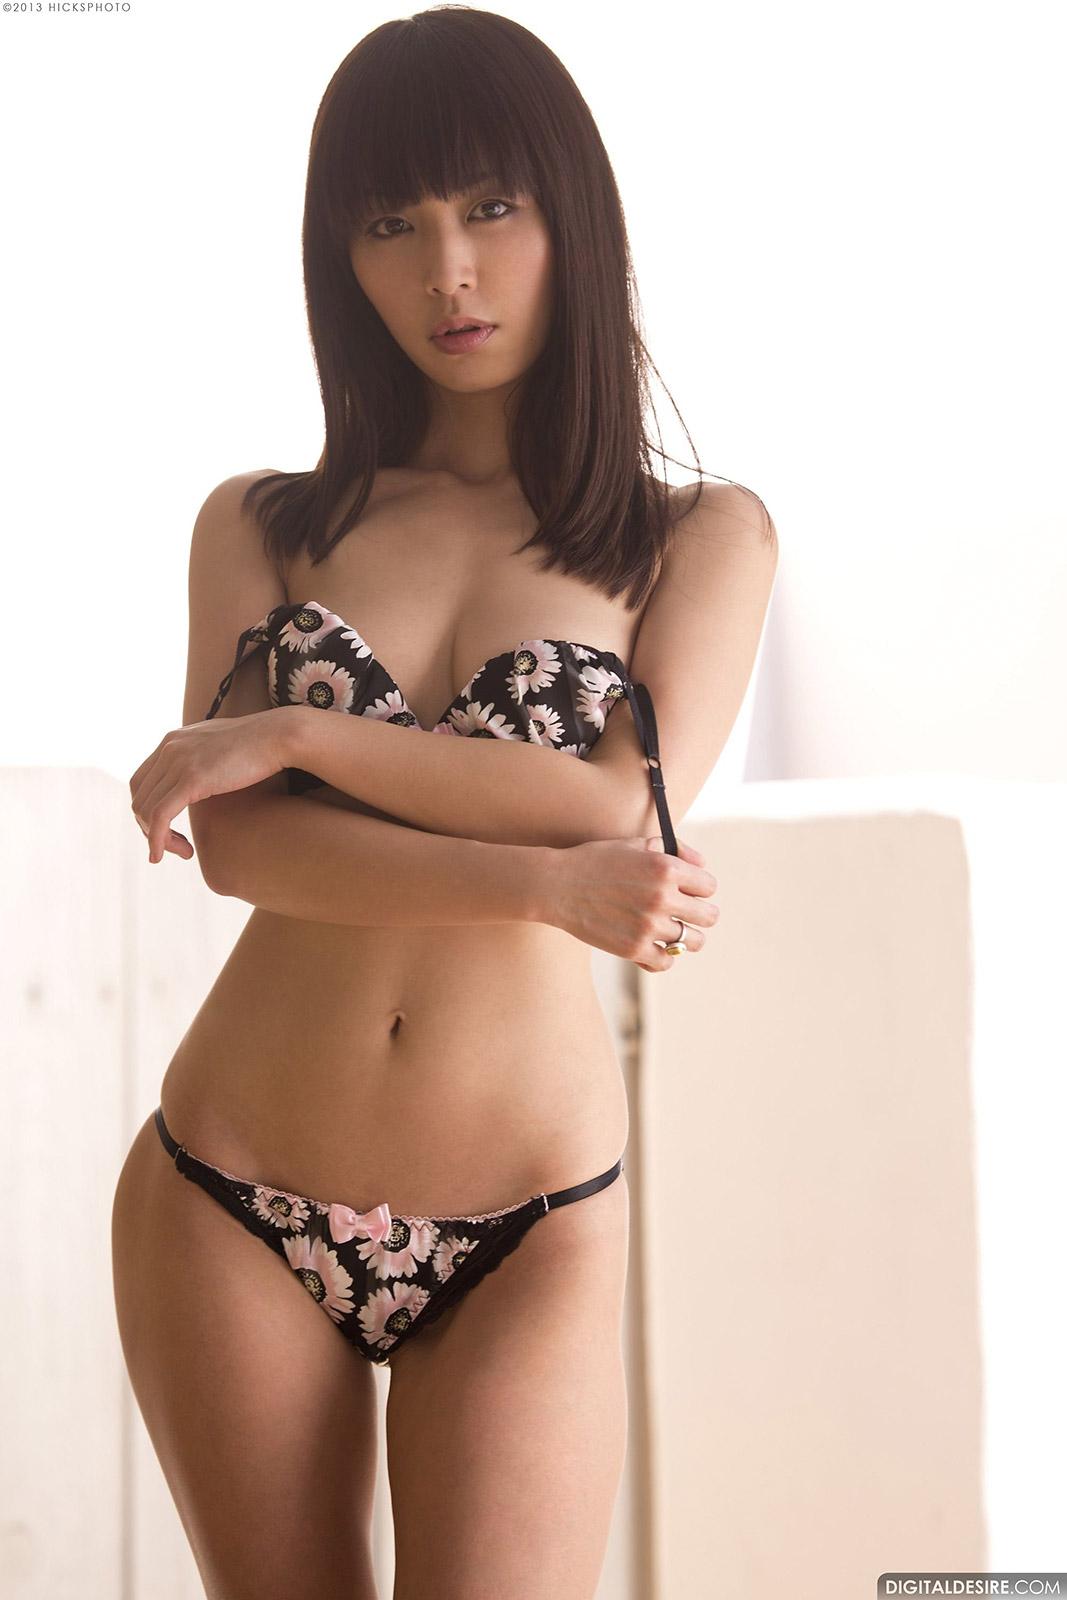 Marica-Haze (32)